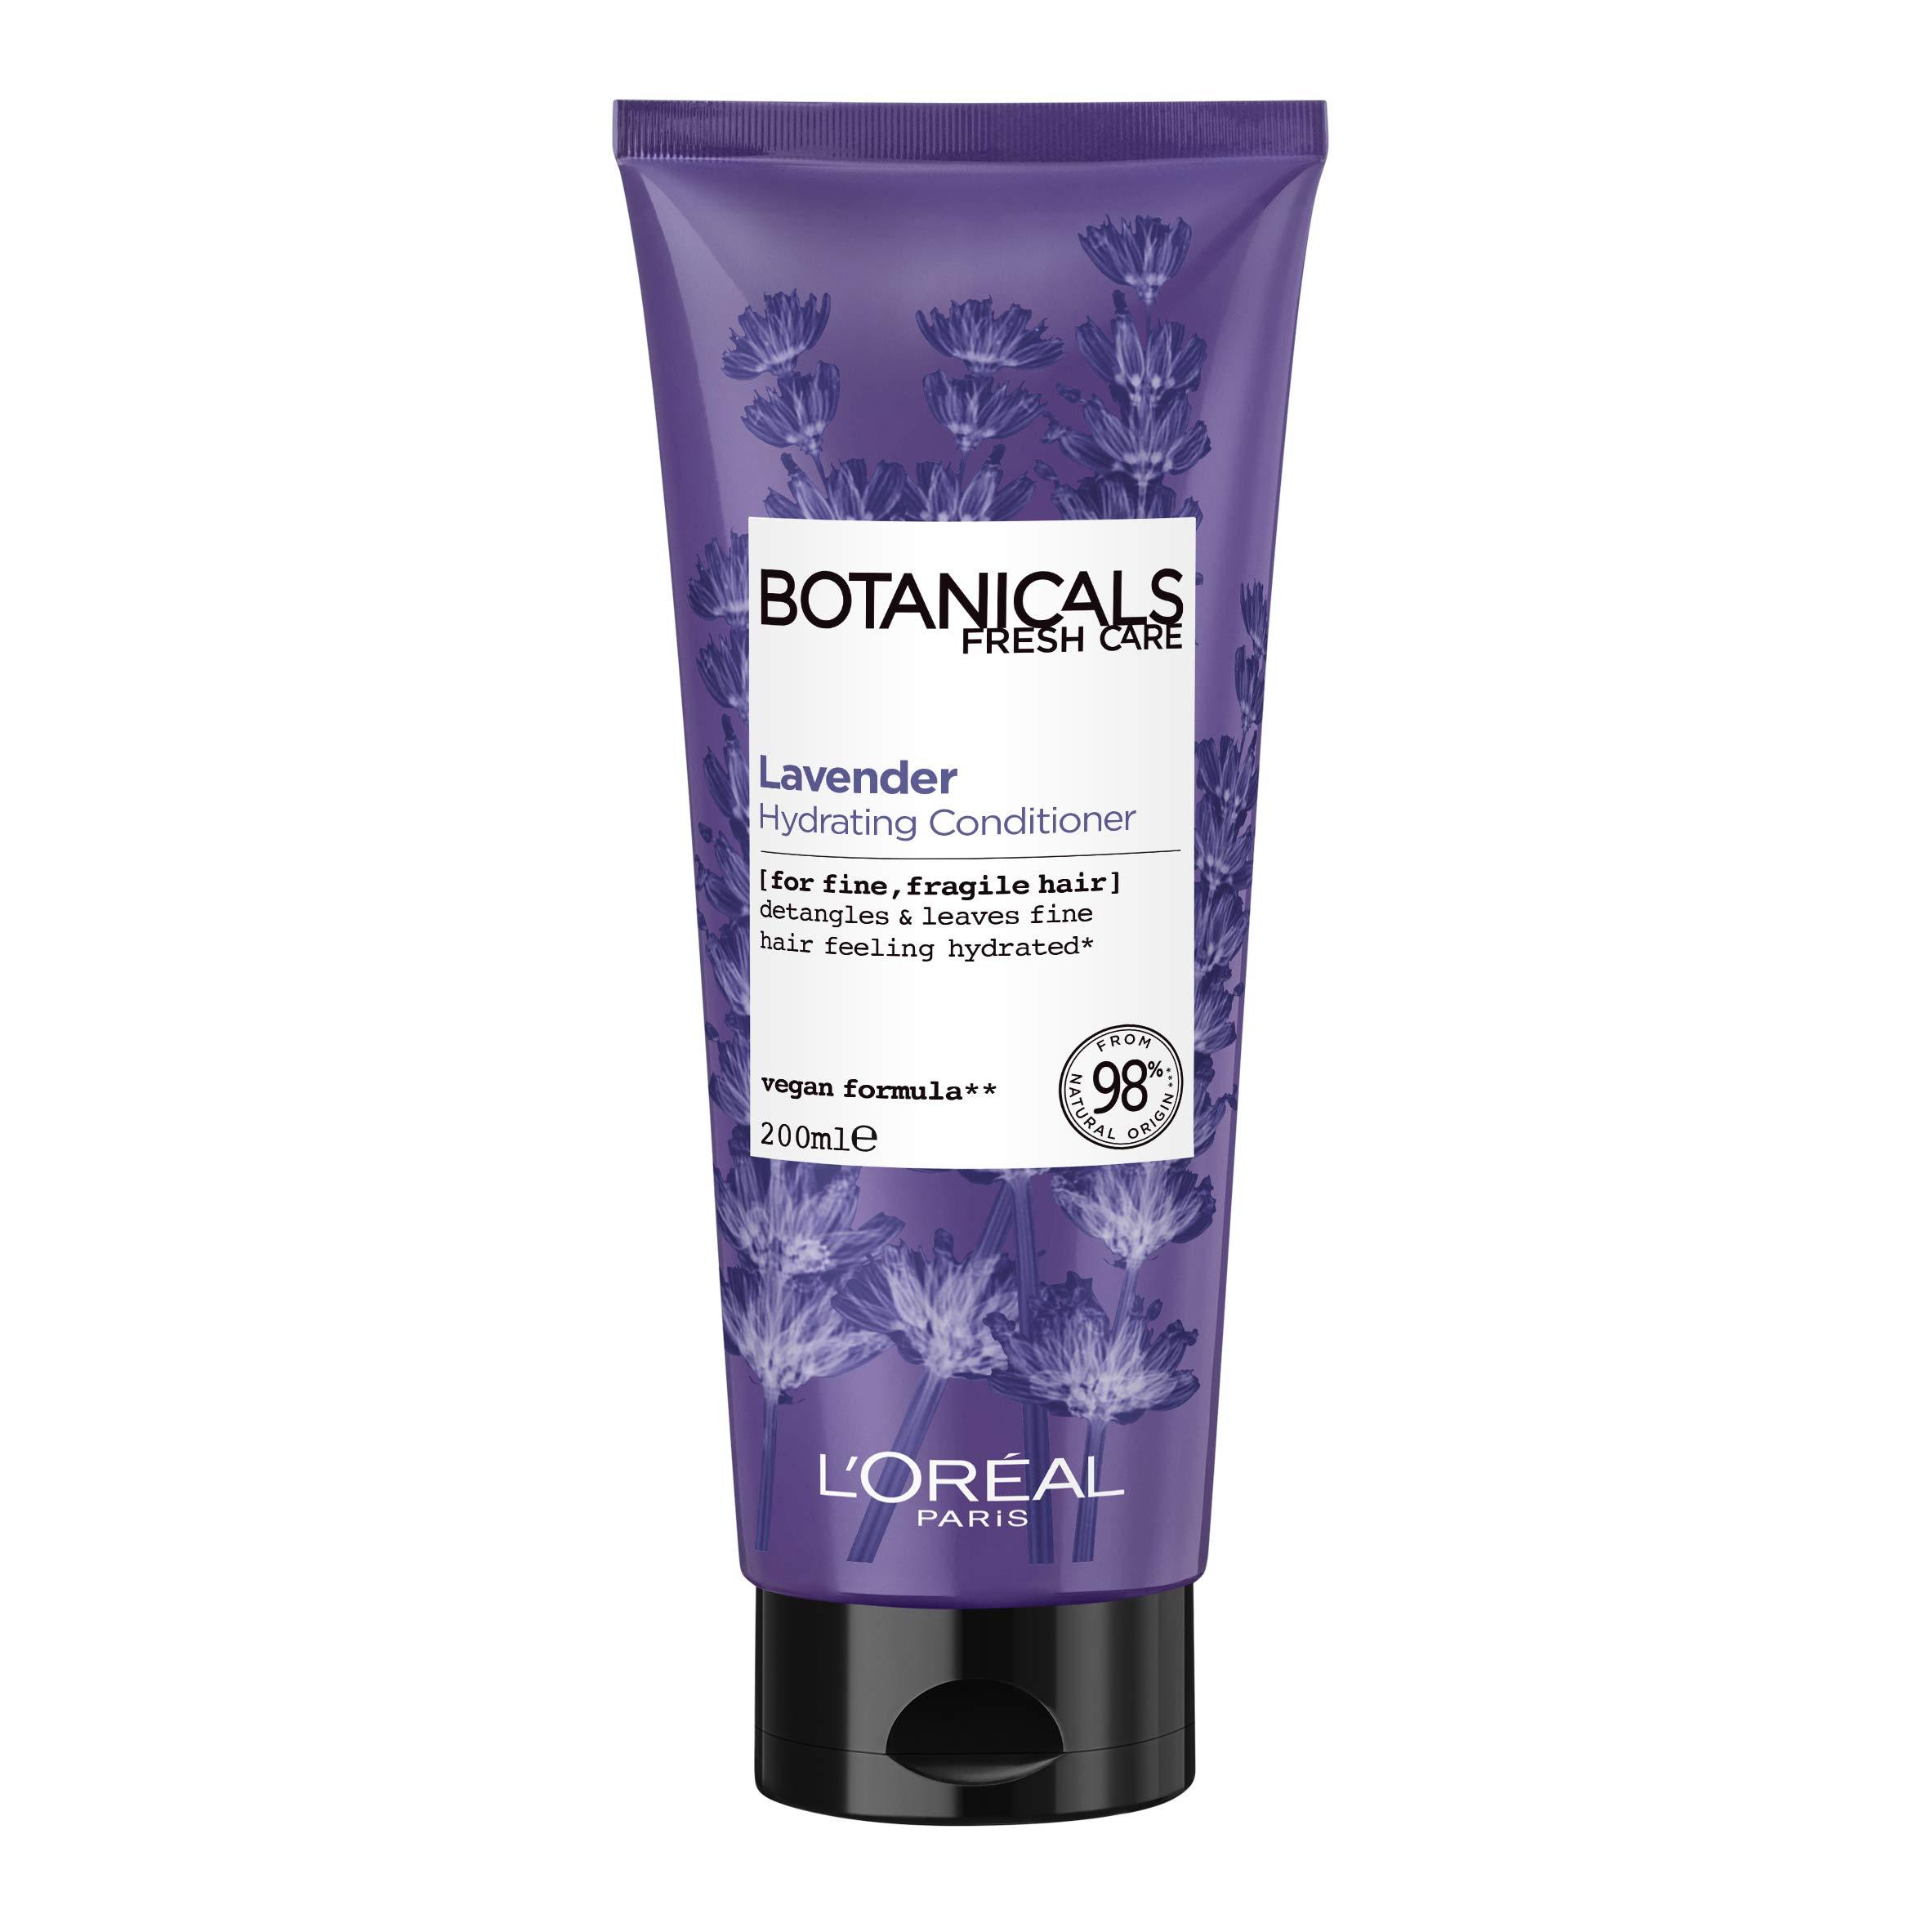 L'Oreal Paris Botanicals Lavender Sensitive Hair & Scalp Vegan Conditioner 200ml (Packaging May Vary)